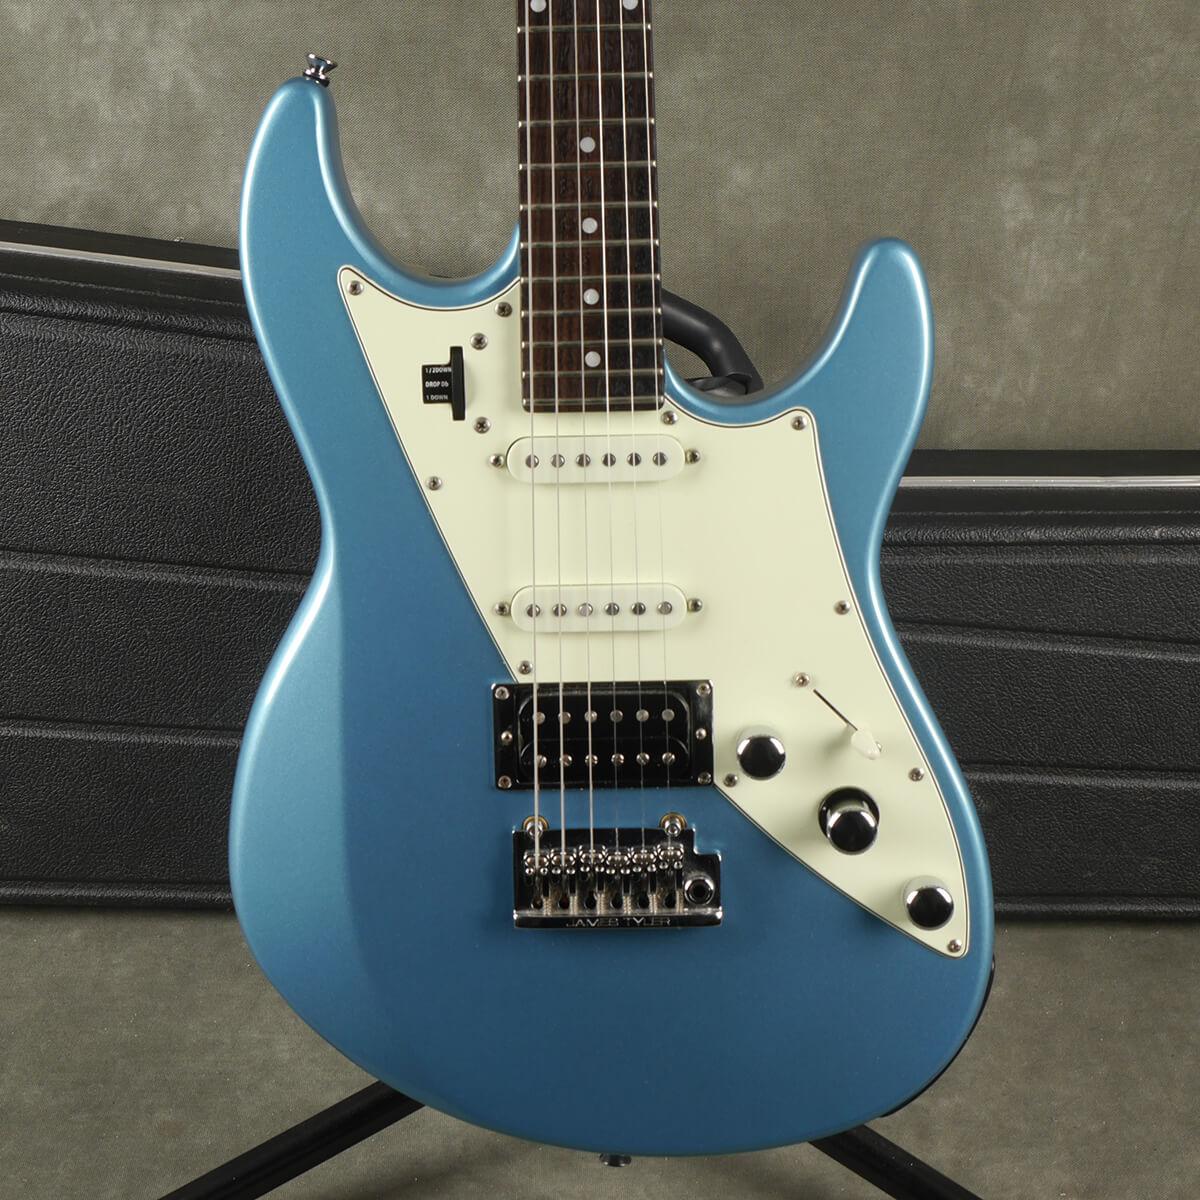 Line 6 James Tyler Variax JTV 69 - Lake Placid Blue w/Hard Case - 2nd Hand